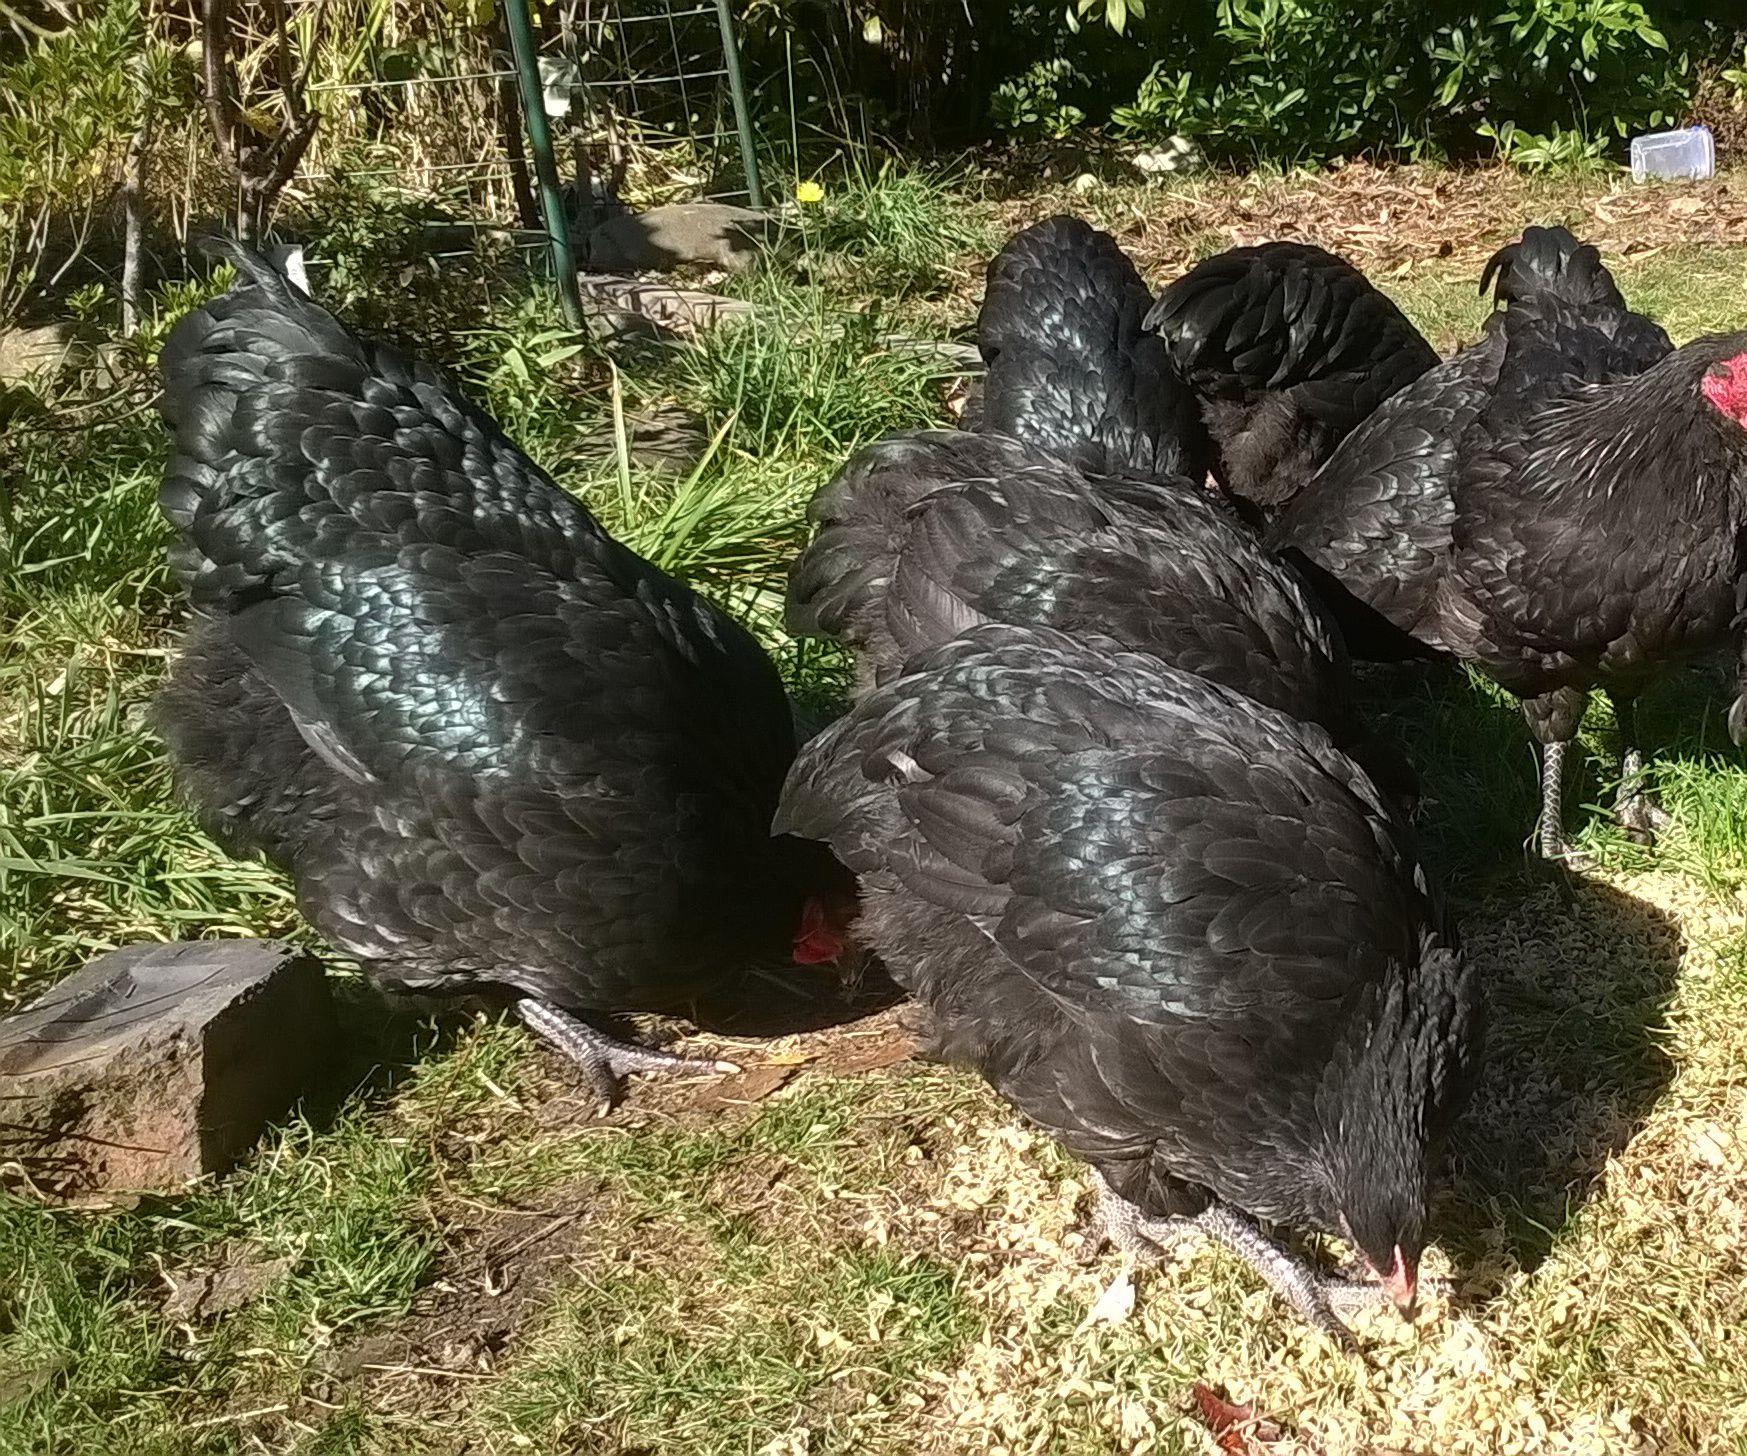 Improved fodder growth system